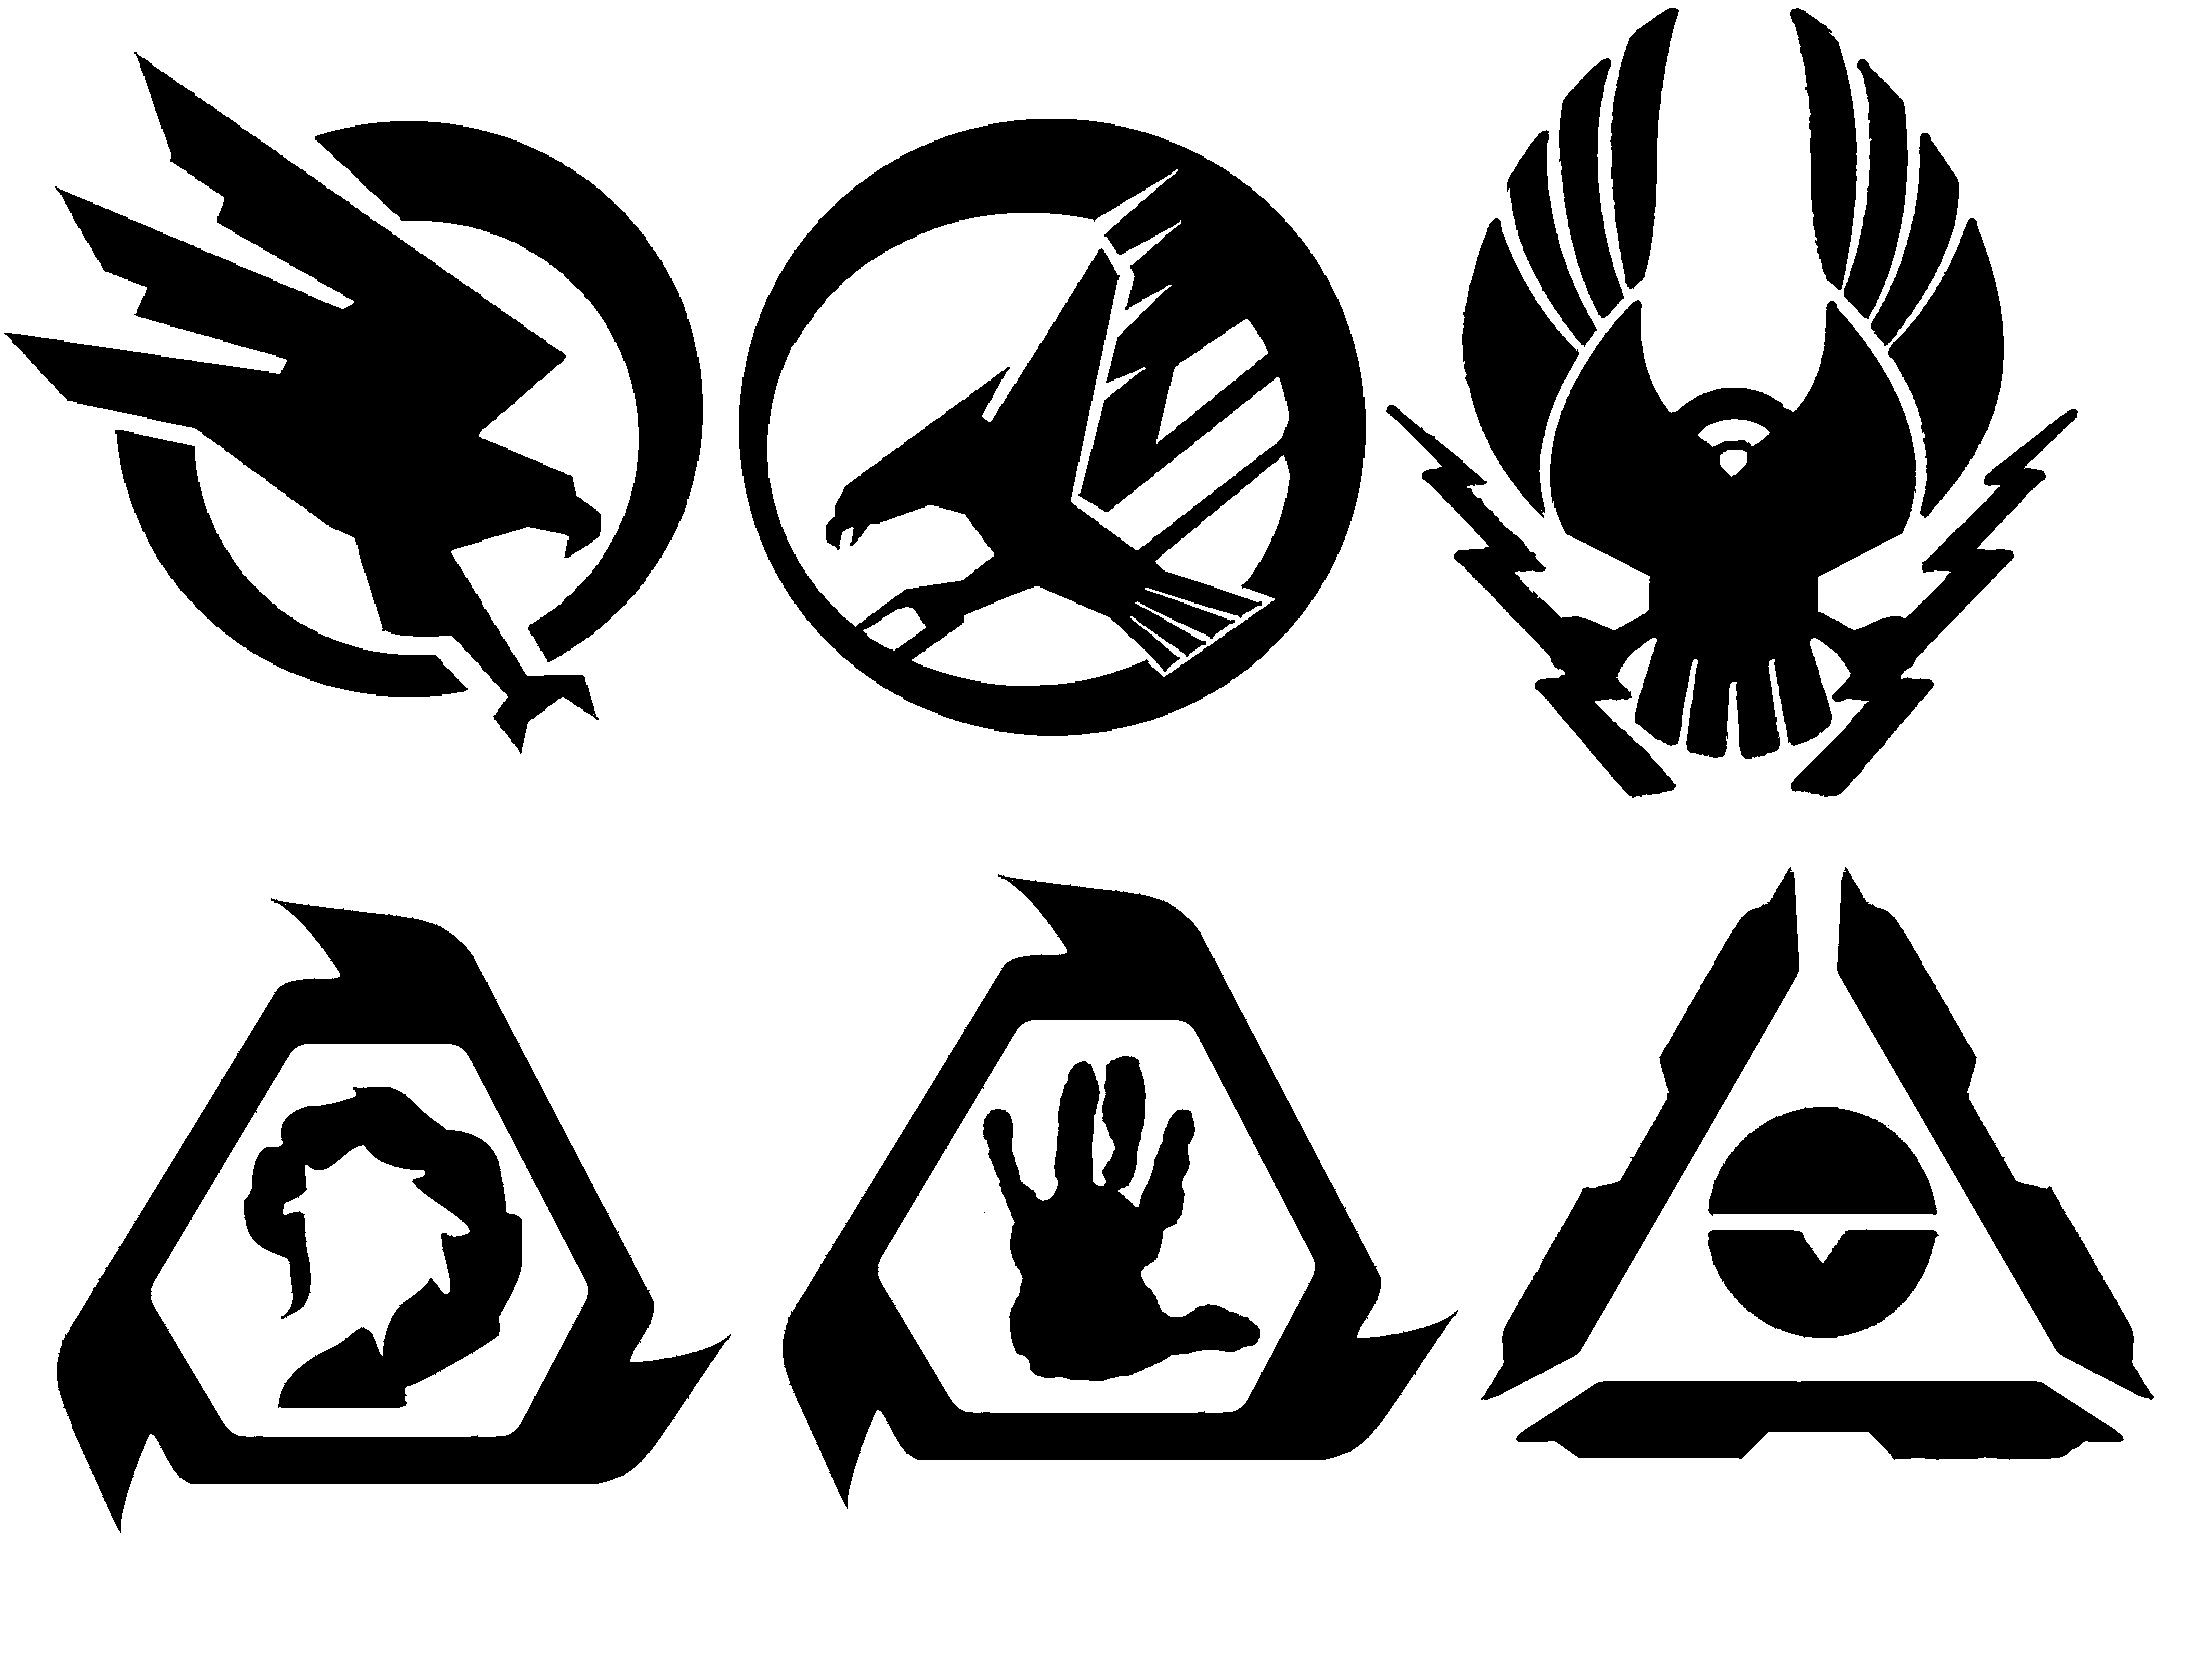 Cool symbols google search random ideas pinterest symbols cool symbols google search biocorpaavc Image collections